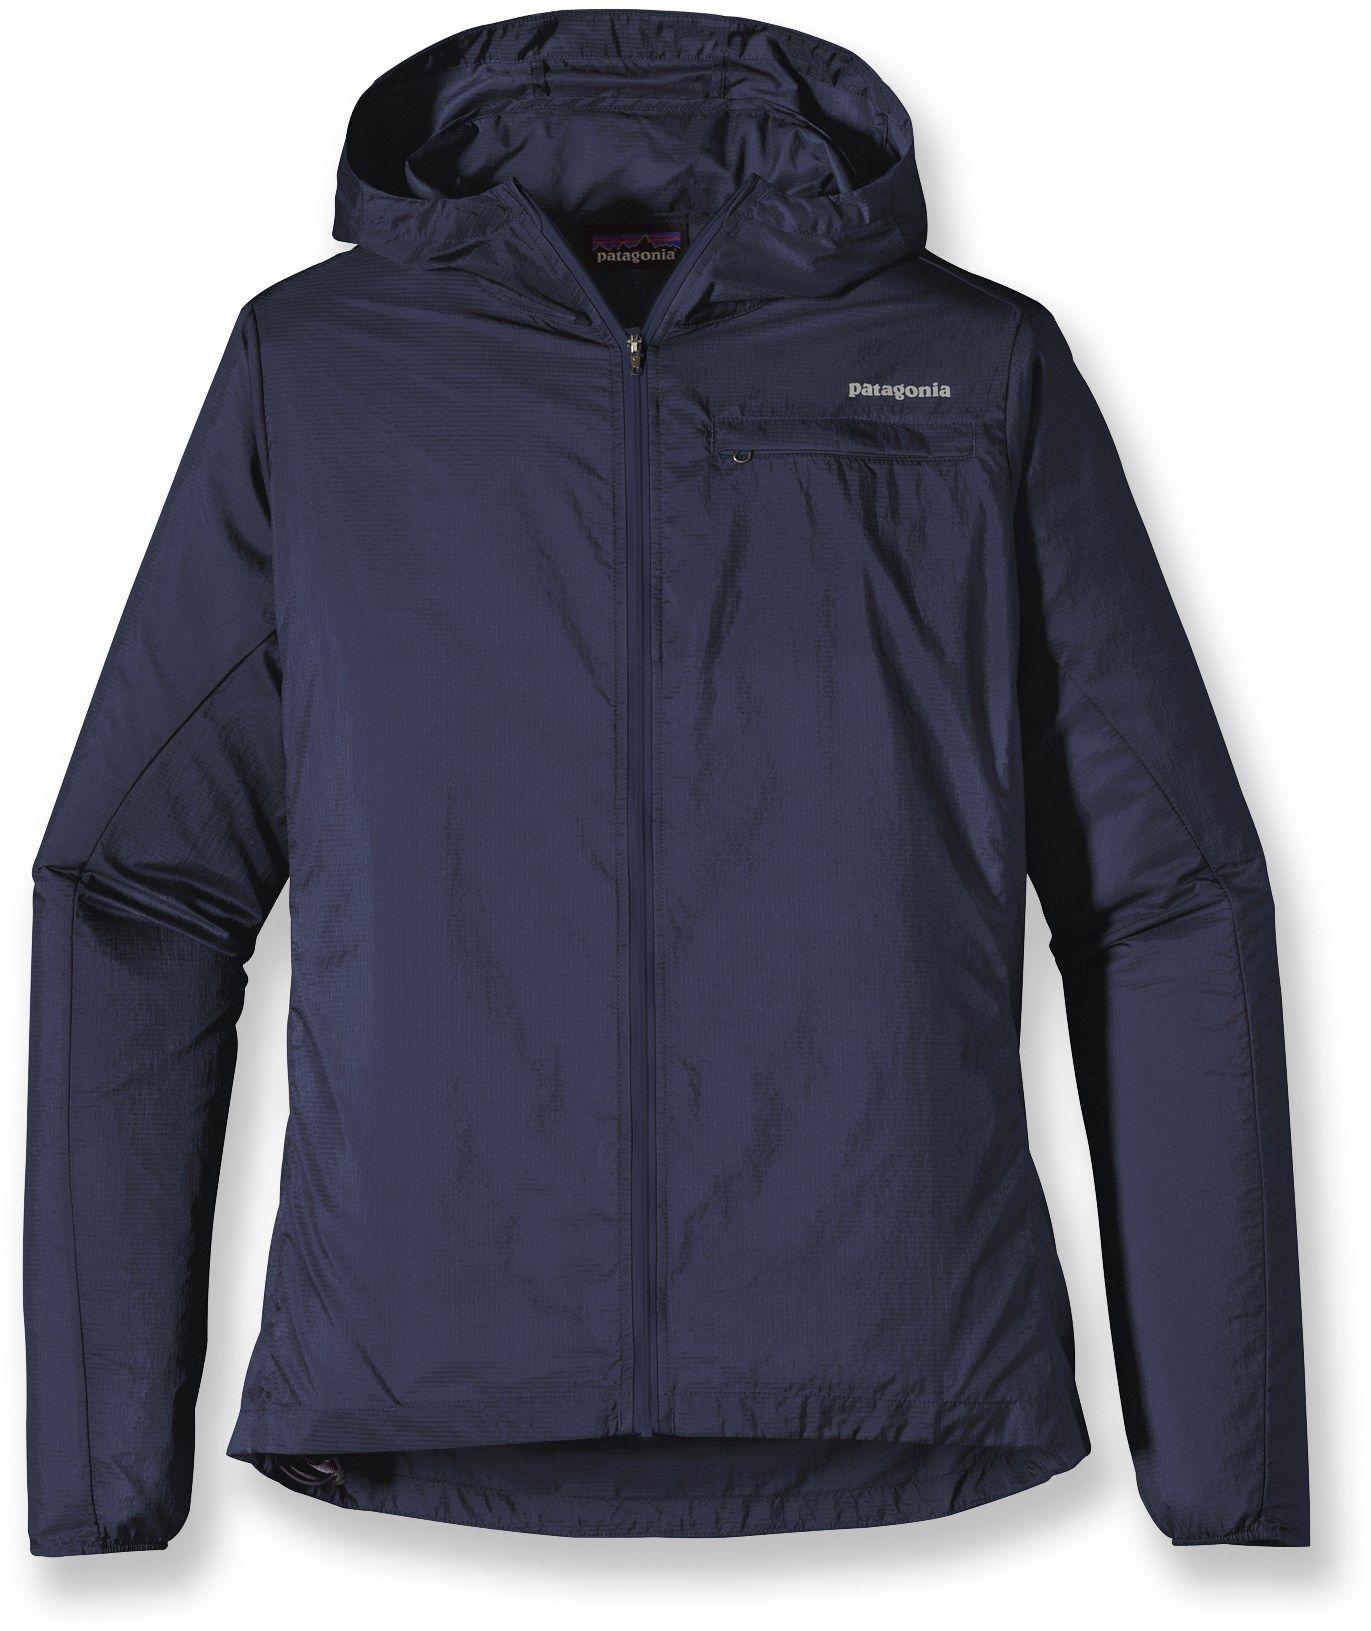 Patagonia Houdini Jacket Women's Jackets for women